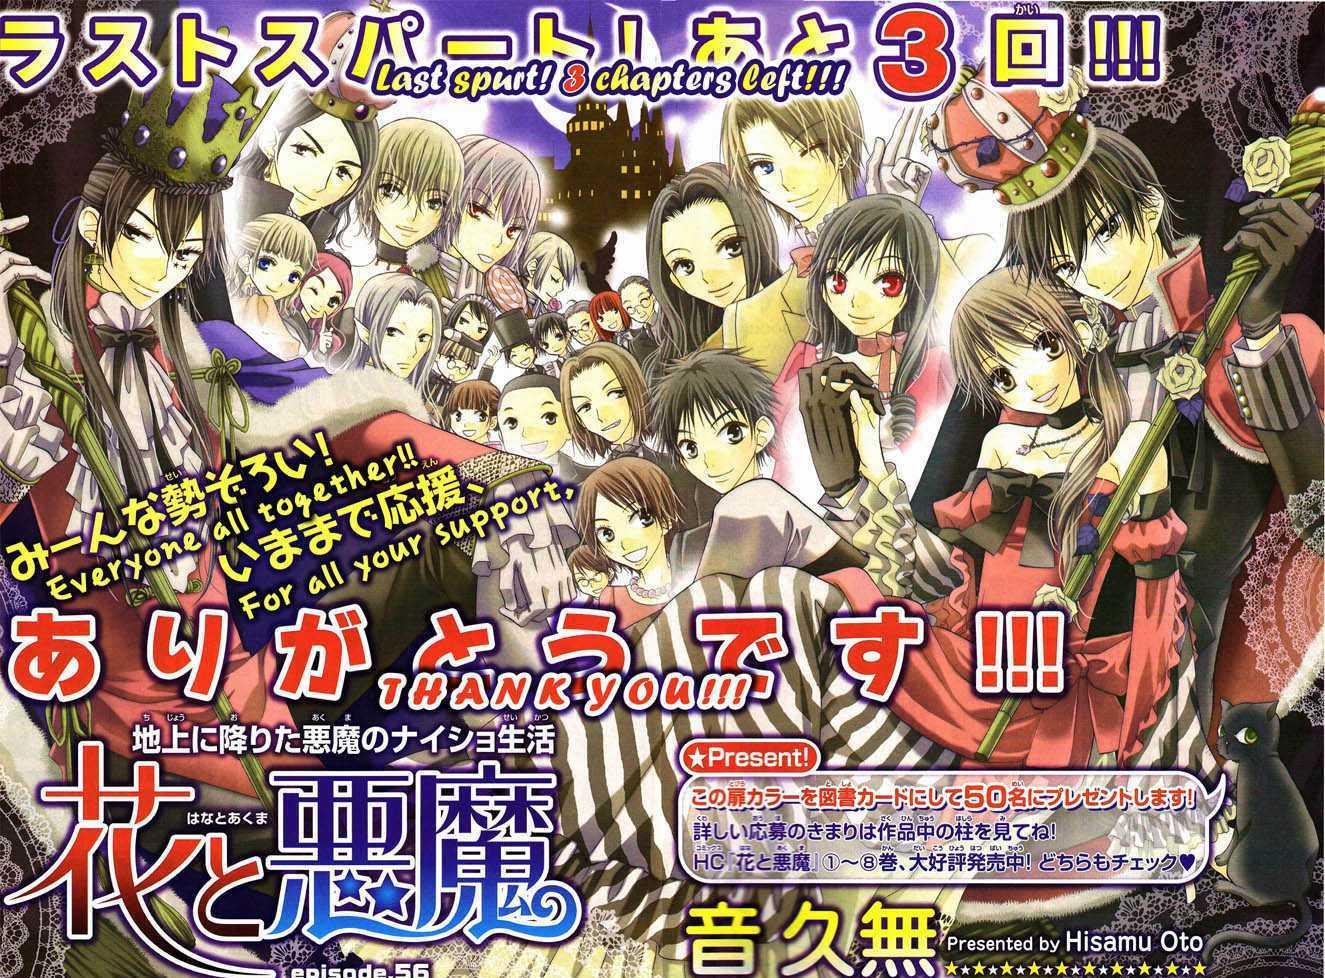 https://im.nineanime.com/comics/pic9/30/7390/129893/HanatoAkuma560428.jpg Page 1